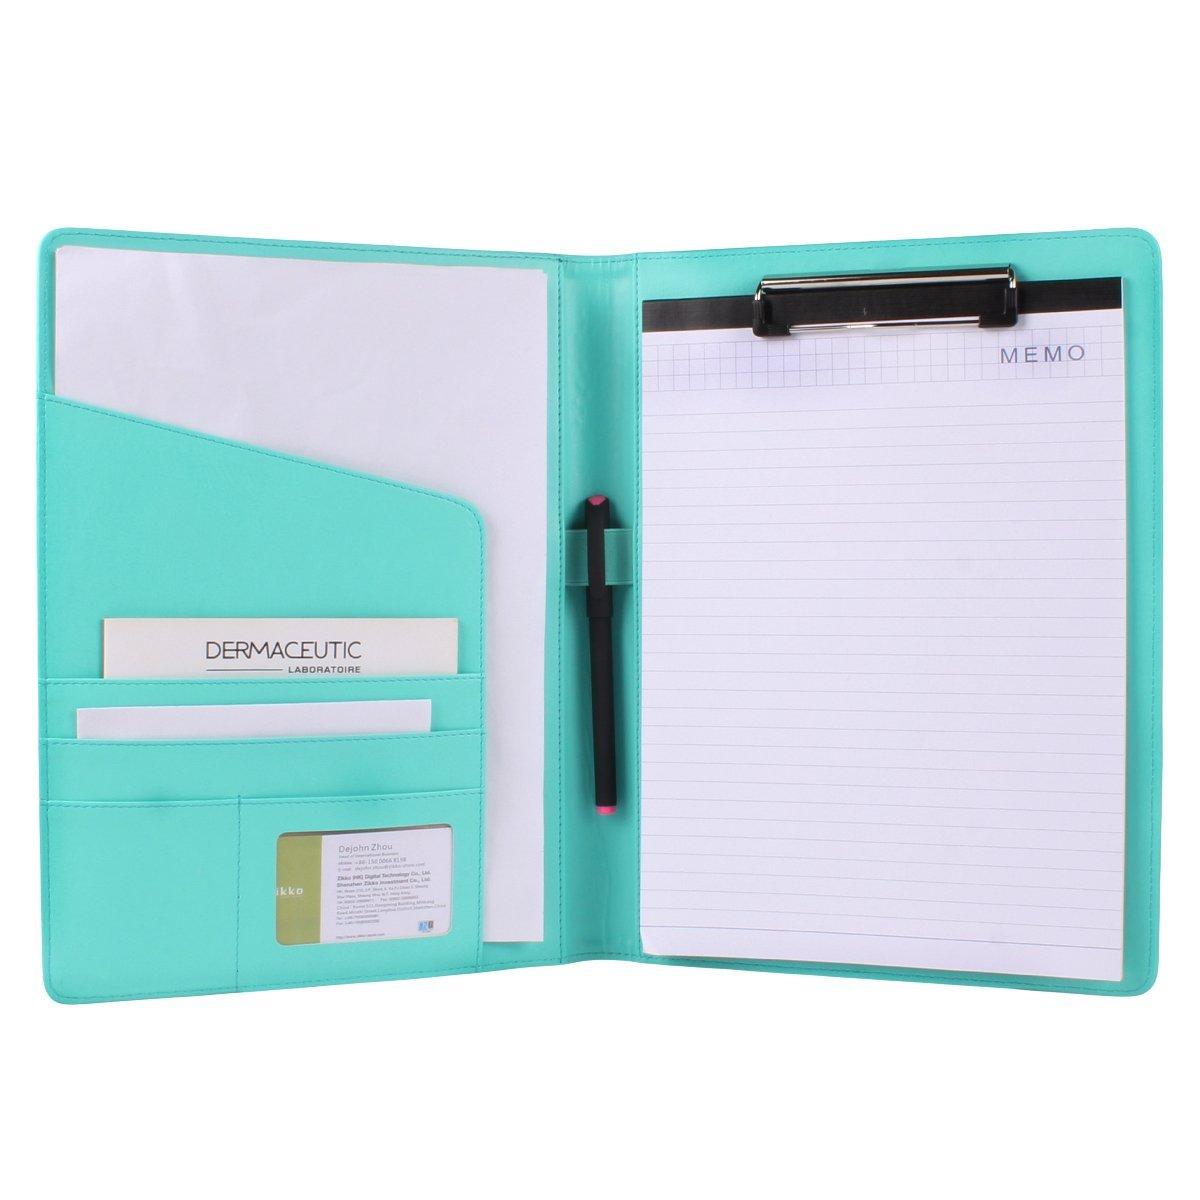 Geila PU Leather Resume Storage Clipboard Folder Portfolio Padfolio for Business School Office Conference (Blue)